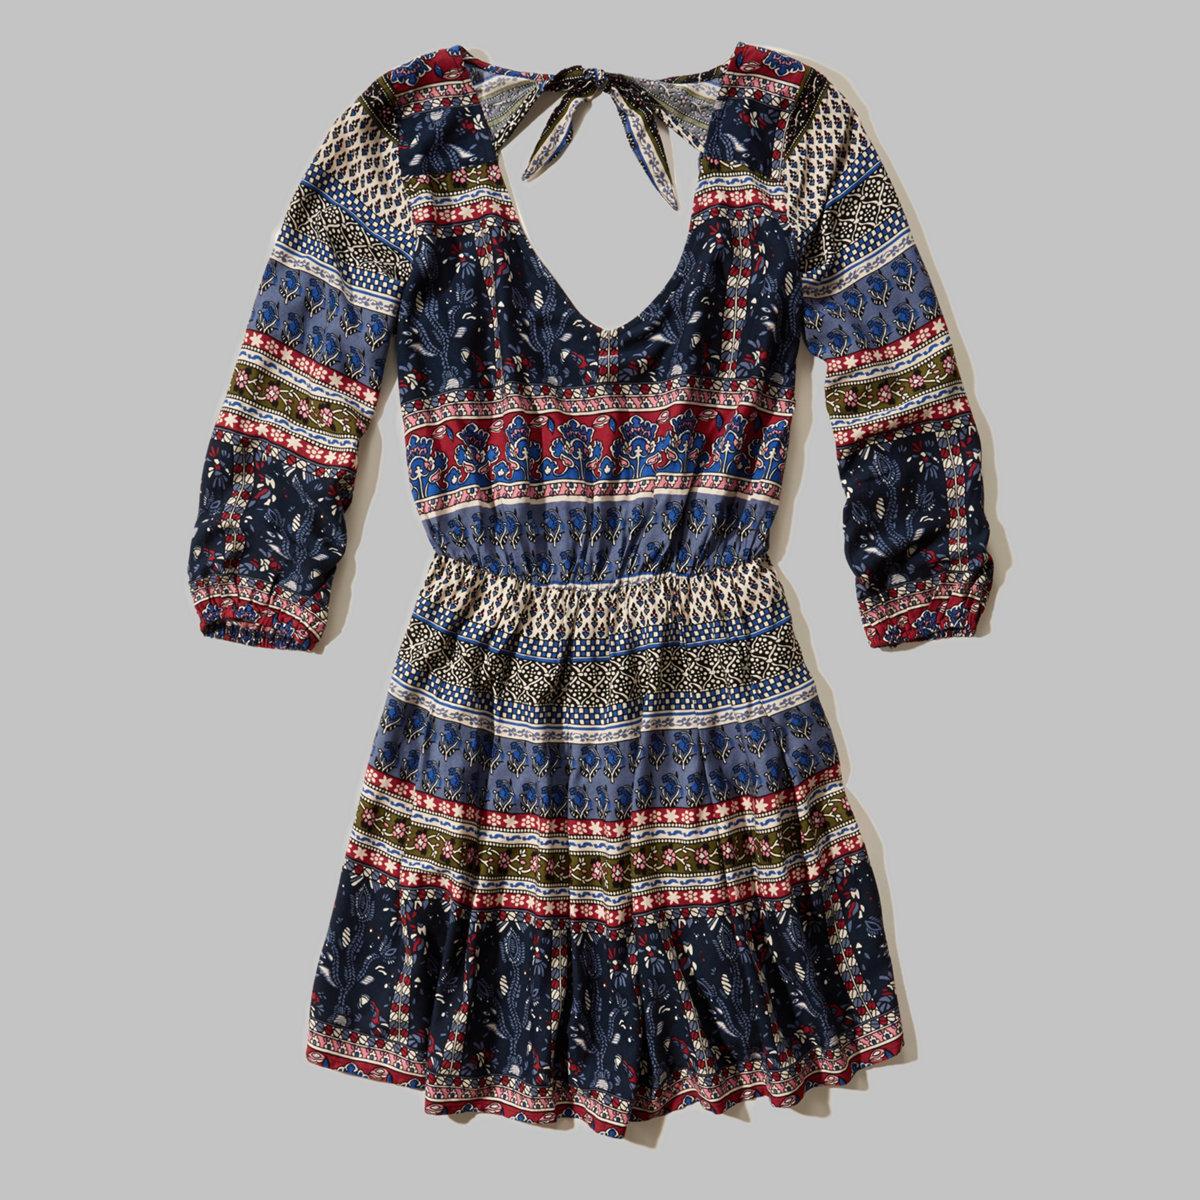 Patterned Peasant Dress